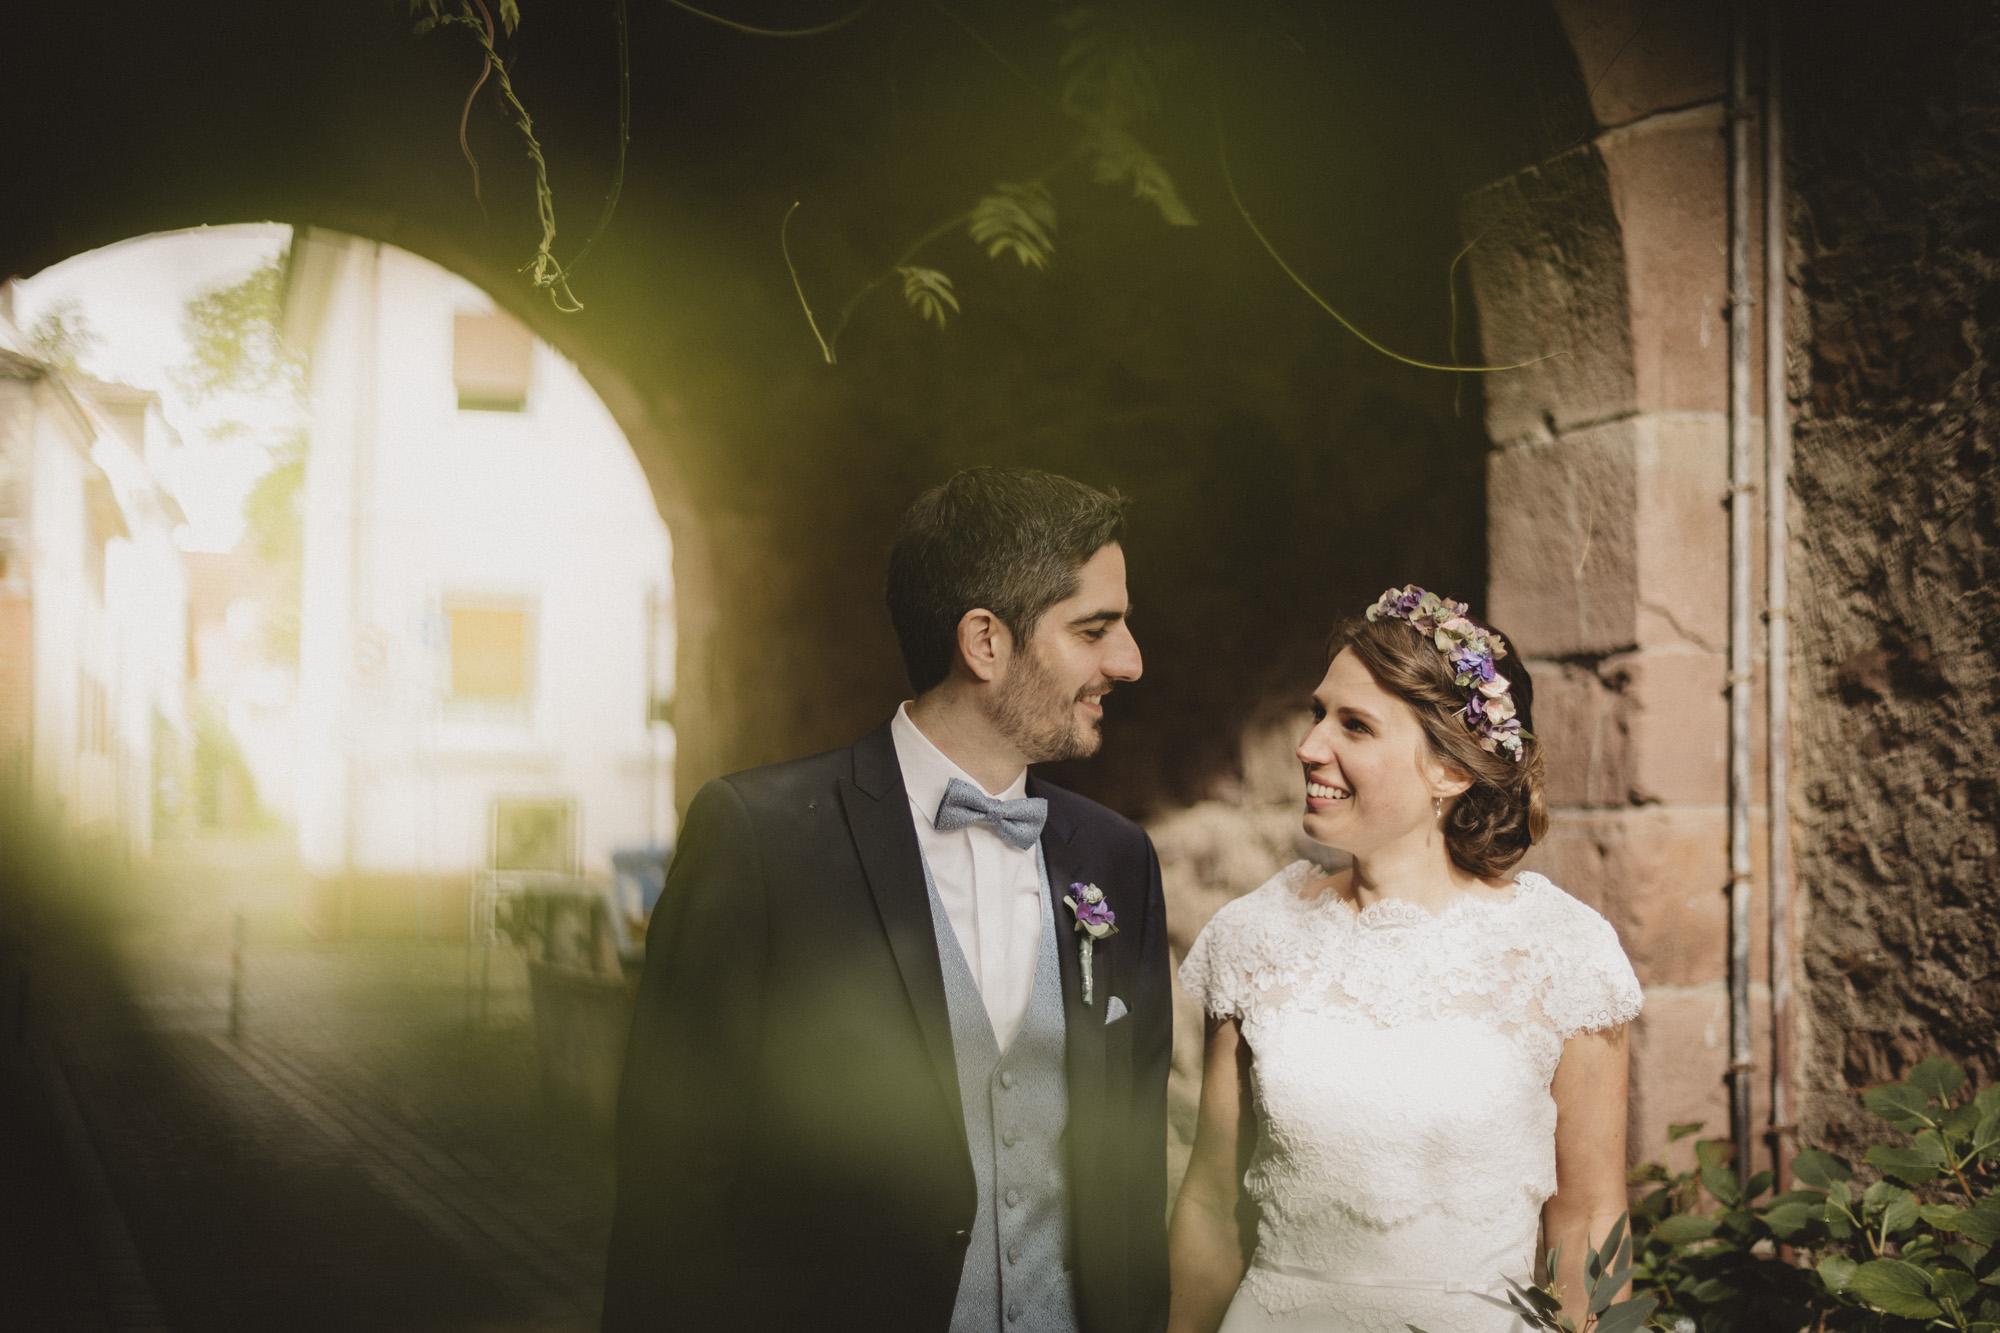 Hochzeitsfotografie-Karlsruhe-Ronja-Flo-16